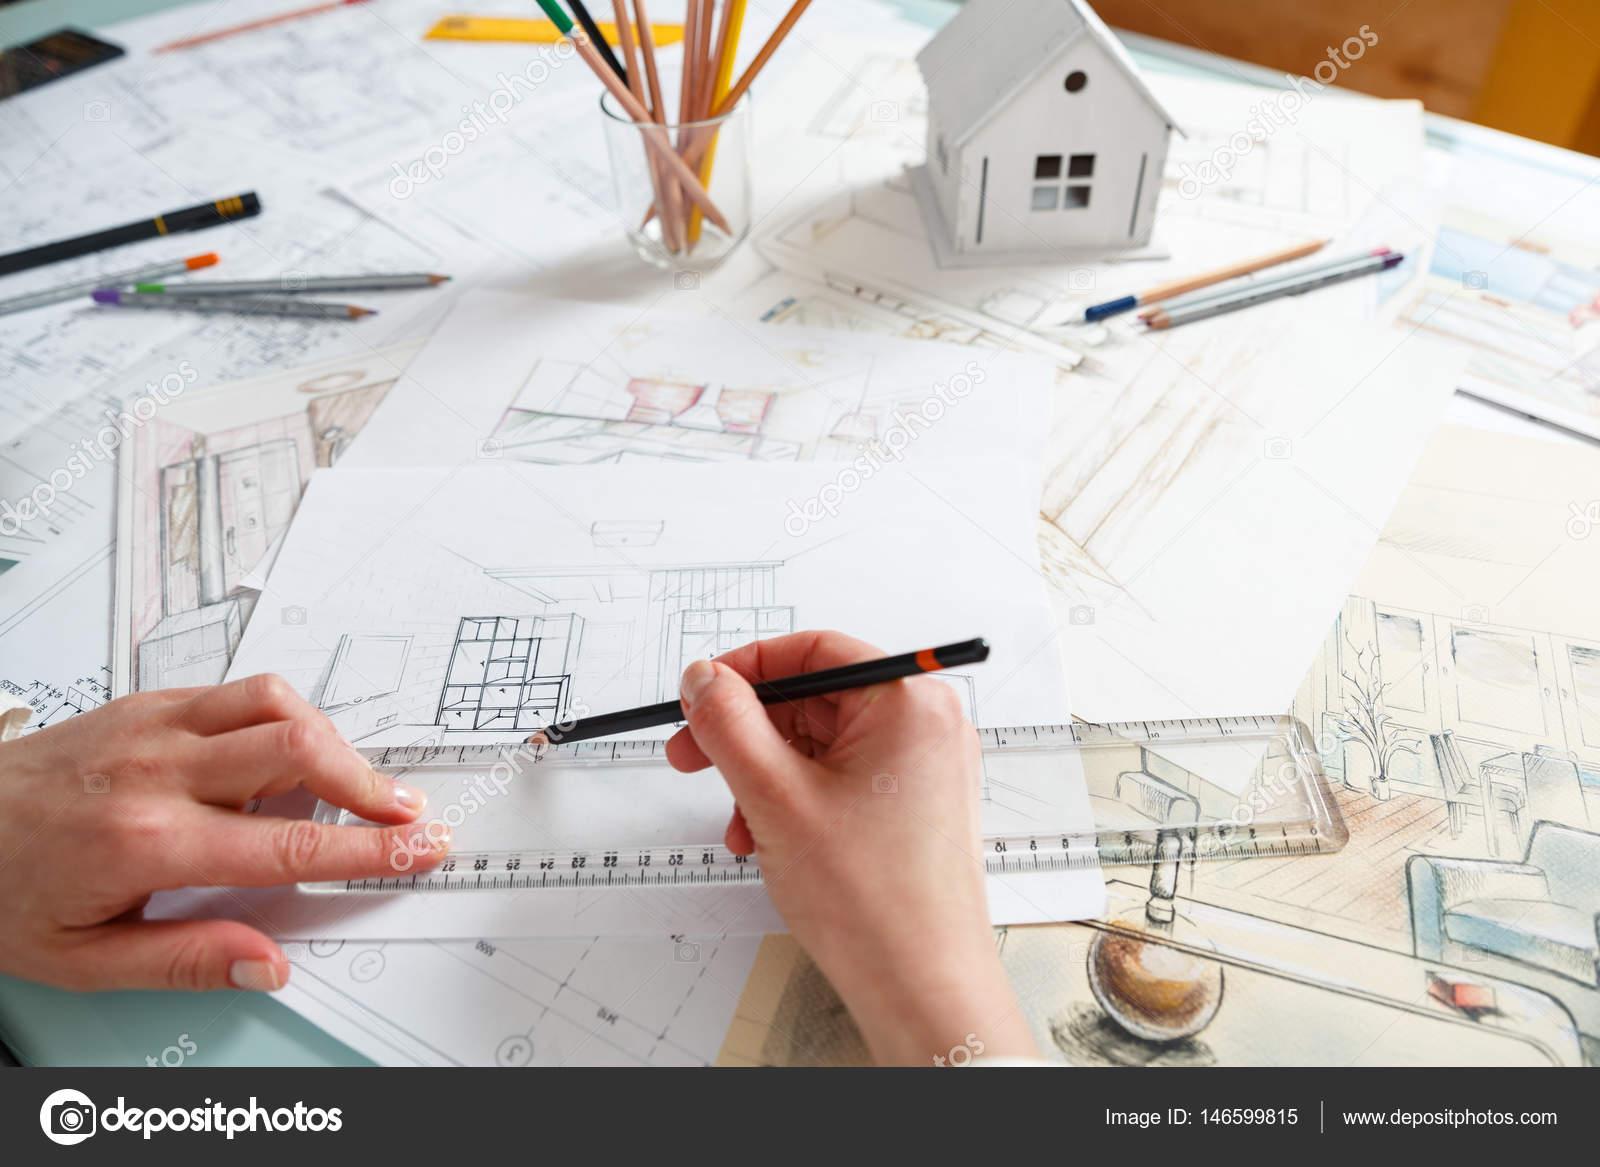 https://st3.depositphotos.com/1000638/14659/i/1600/depositphotos_146599815-stock-photo-designer-works-with-hand-drawing.jpg